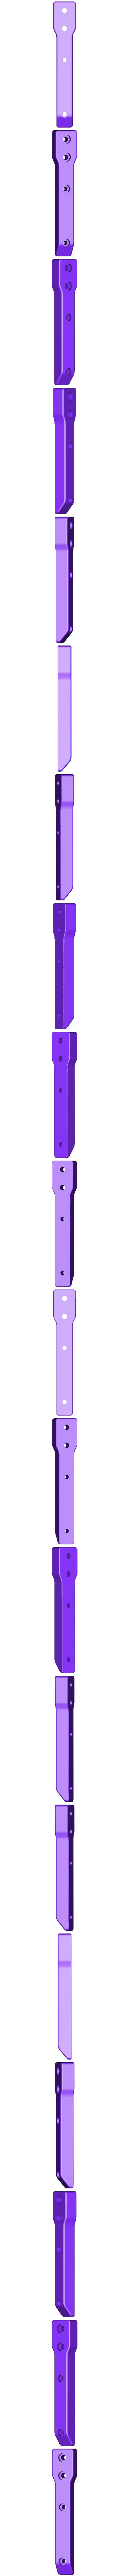 Drawer Box Mount Arm.STL Download STL file Ender 3 Pro Storage Mod Kit • Object to 3D print, a3rdDimension